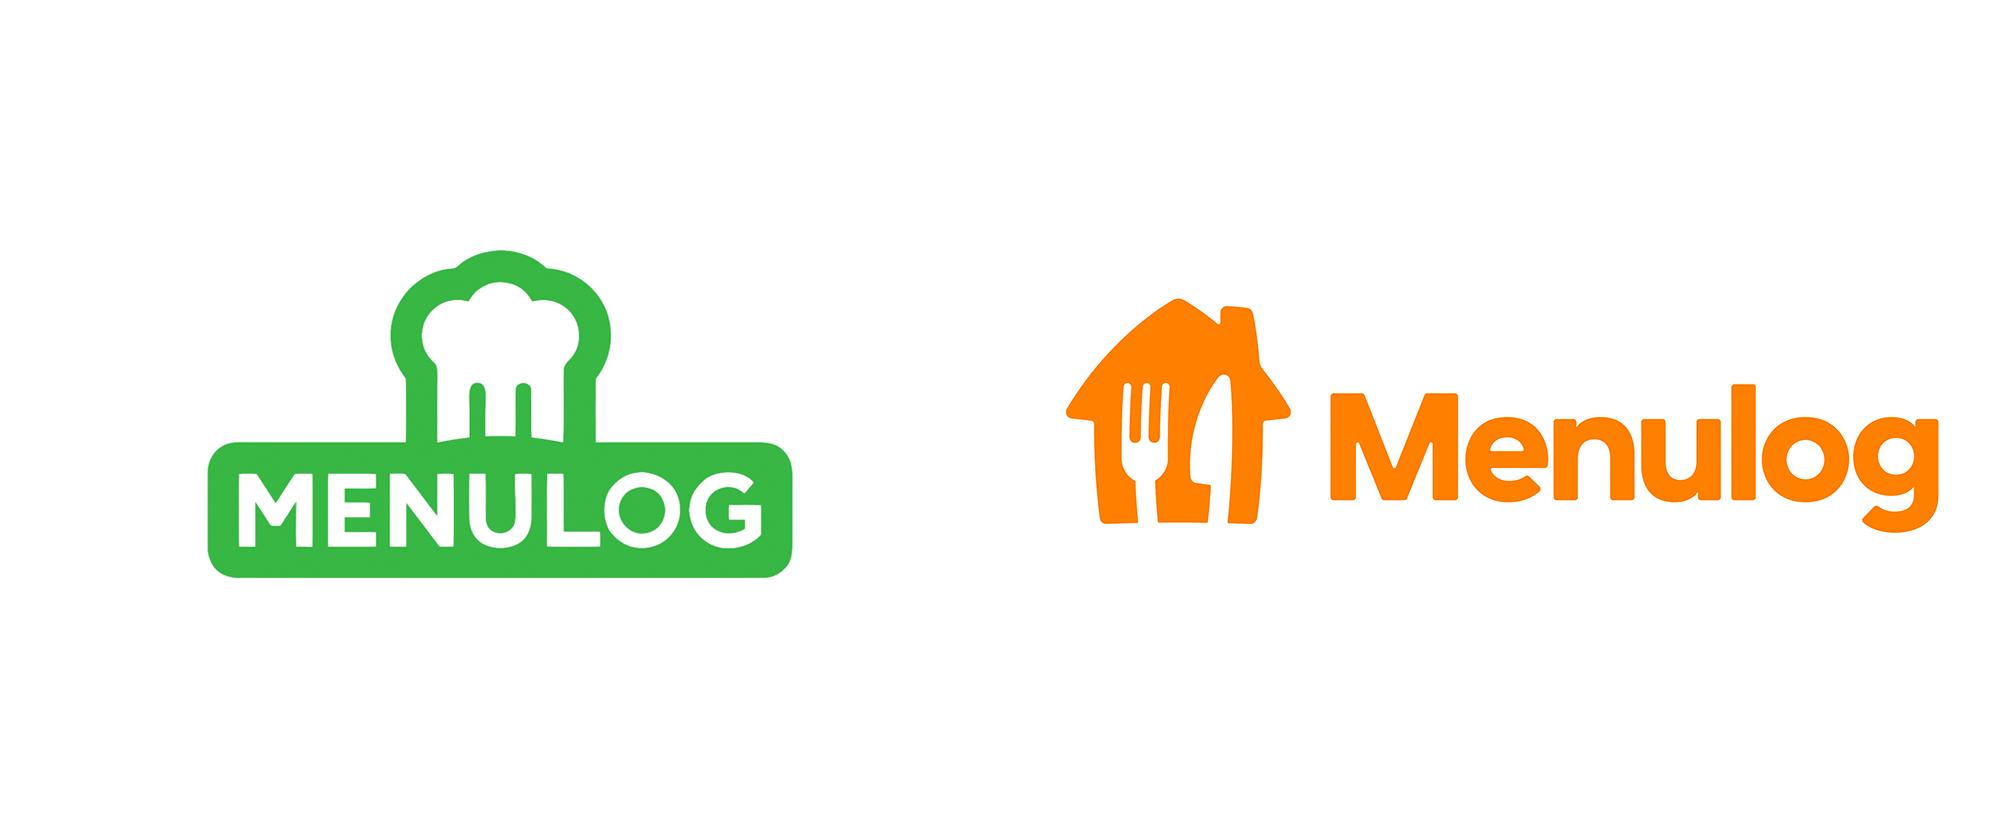 New Logo for Menulog